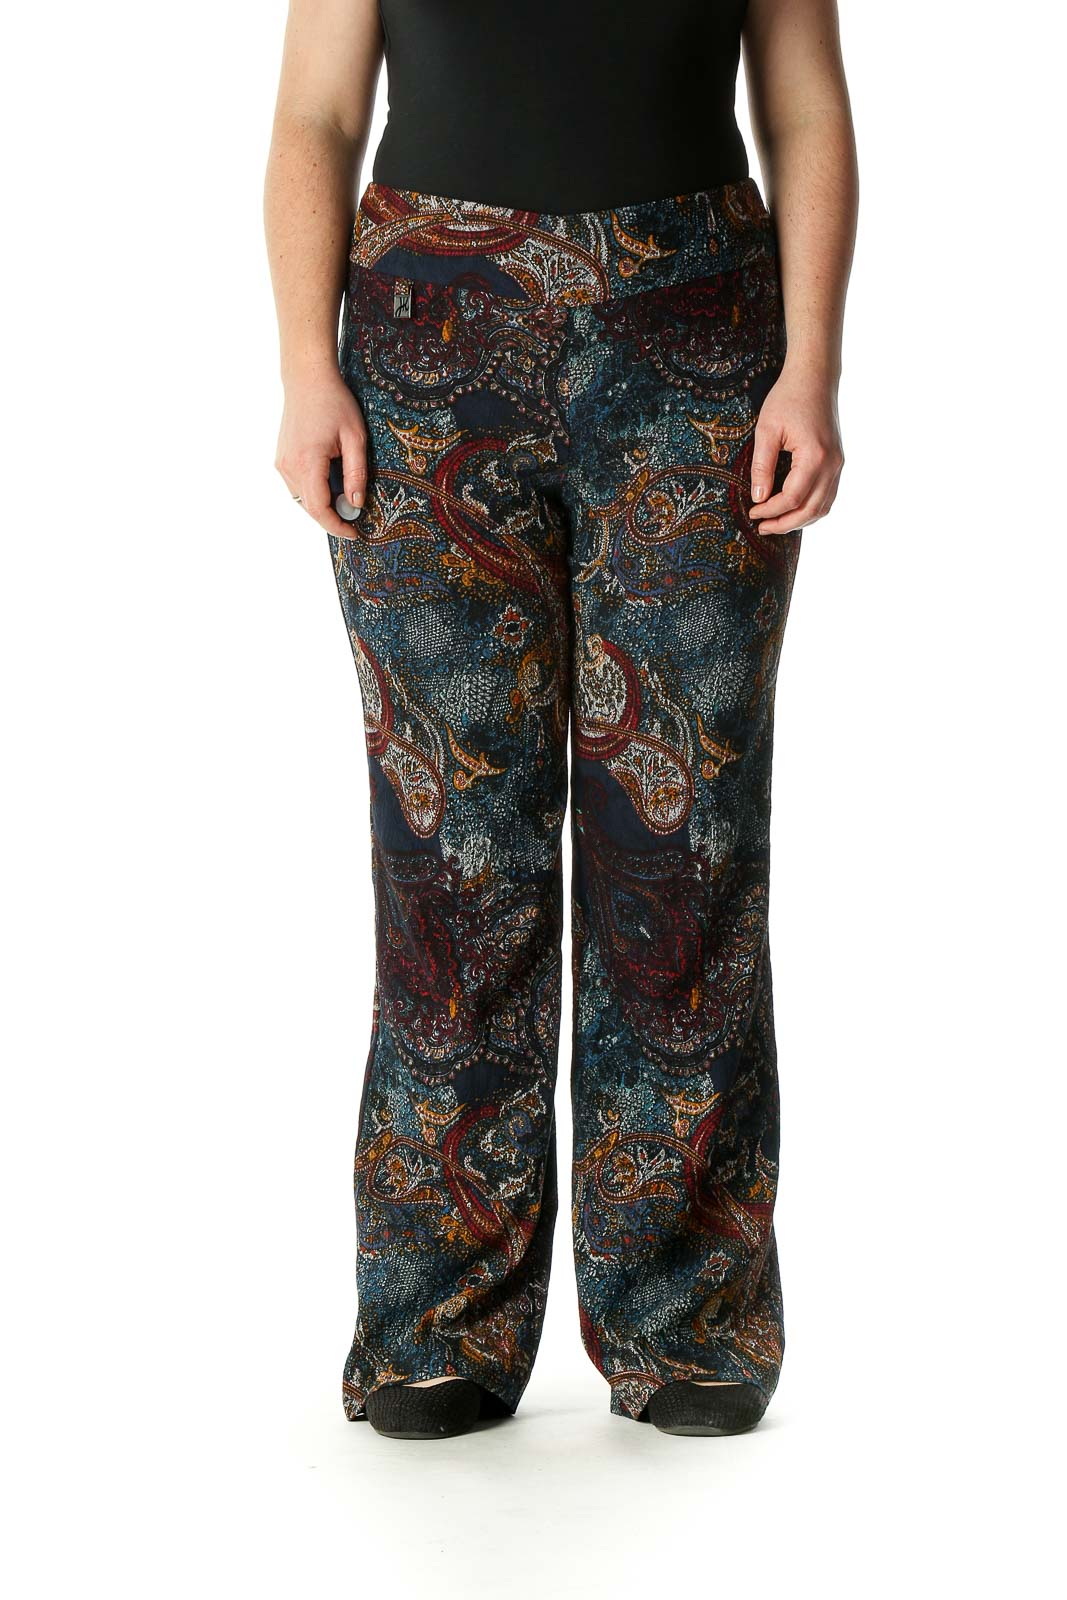 Black Paisley Bohemian Trousers Front